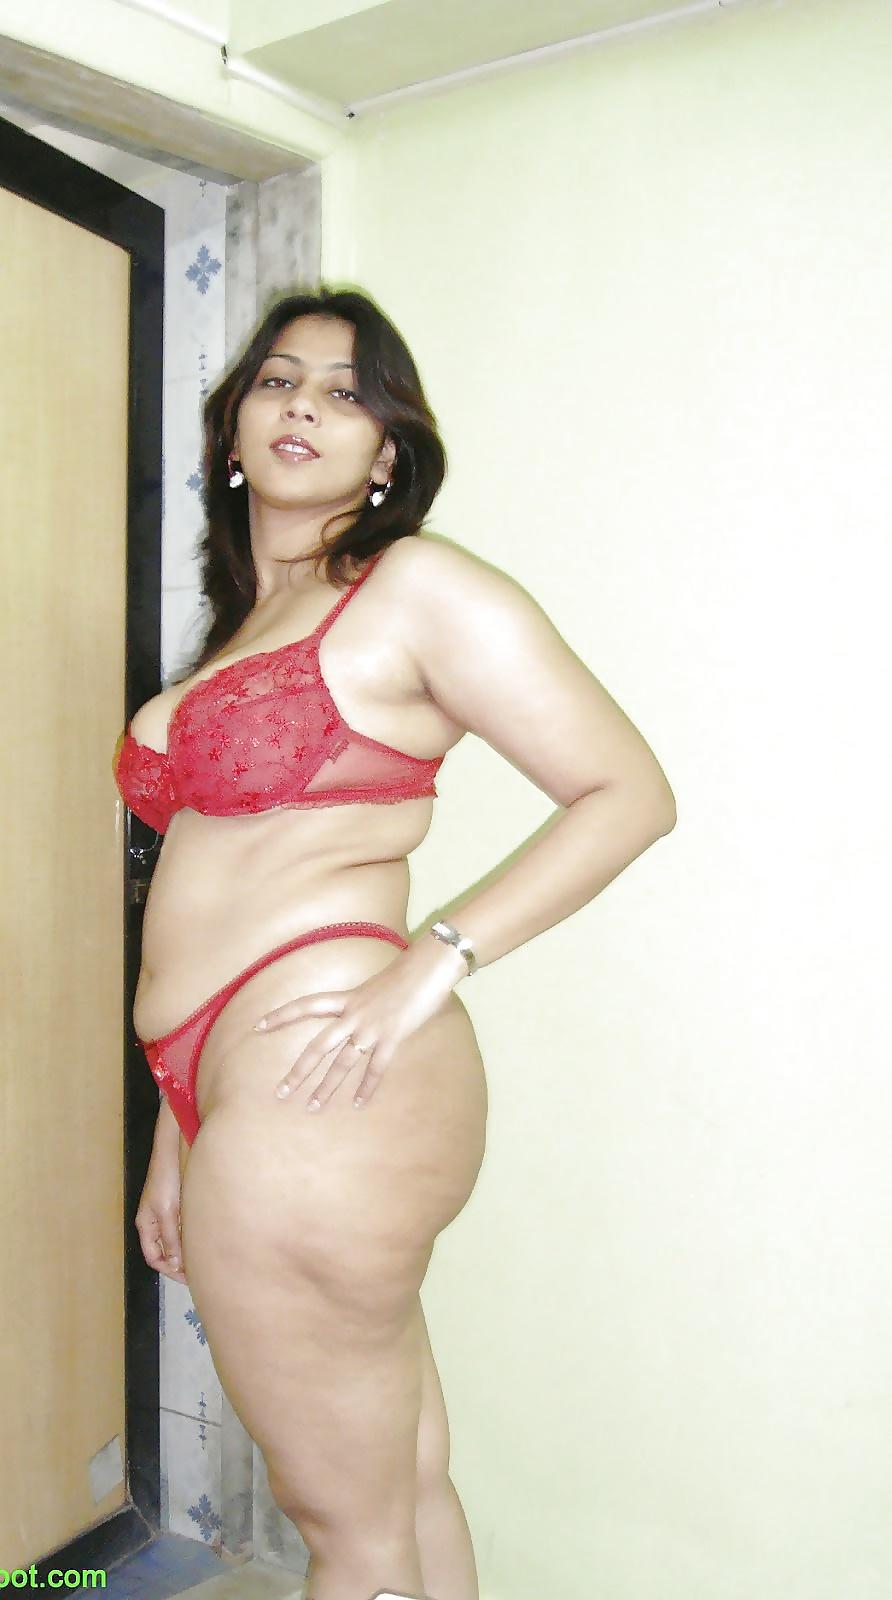 Erotic Image Pornstar comma sutra